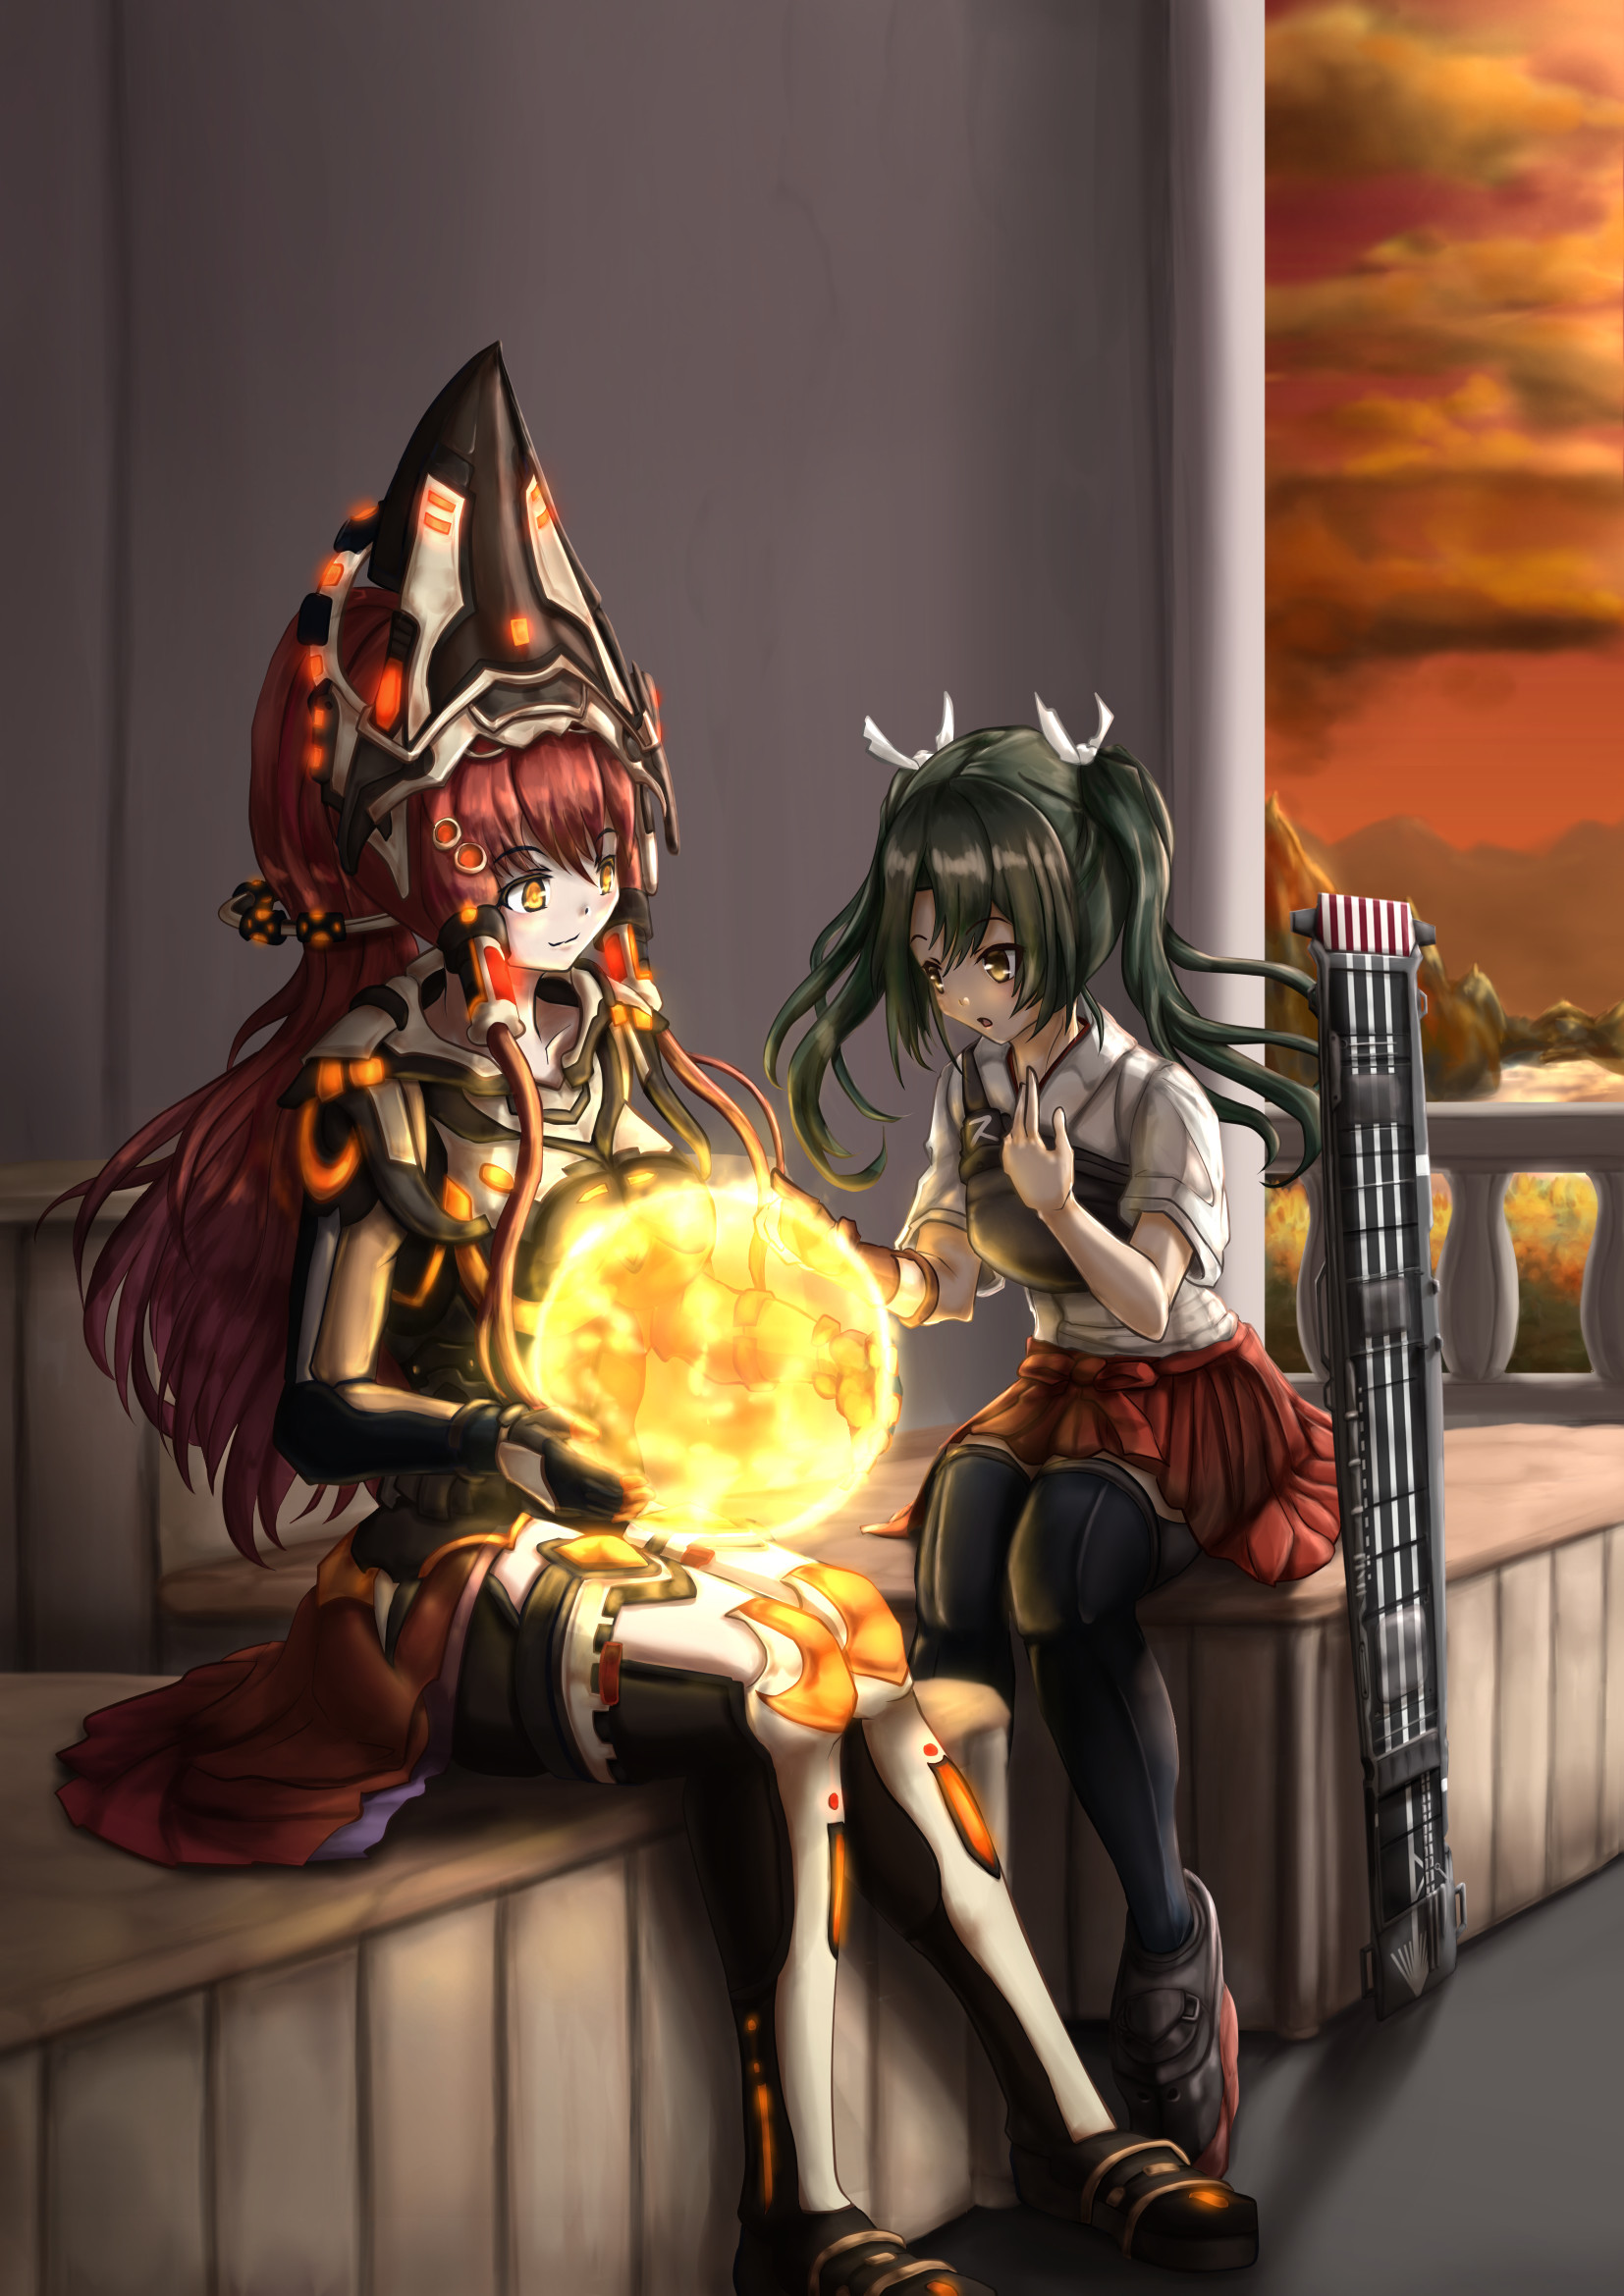 Power Awakening (Disruptor and Zuikaku)